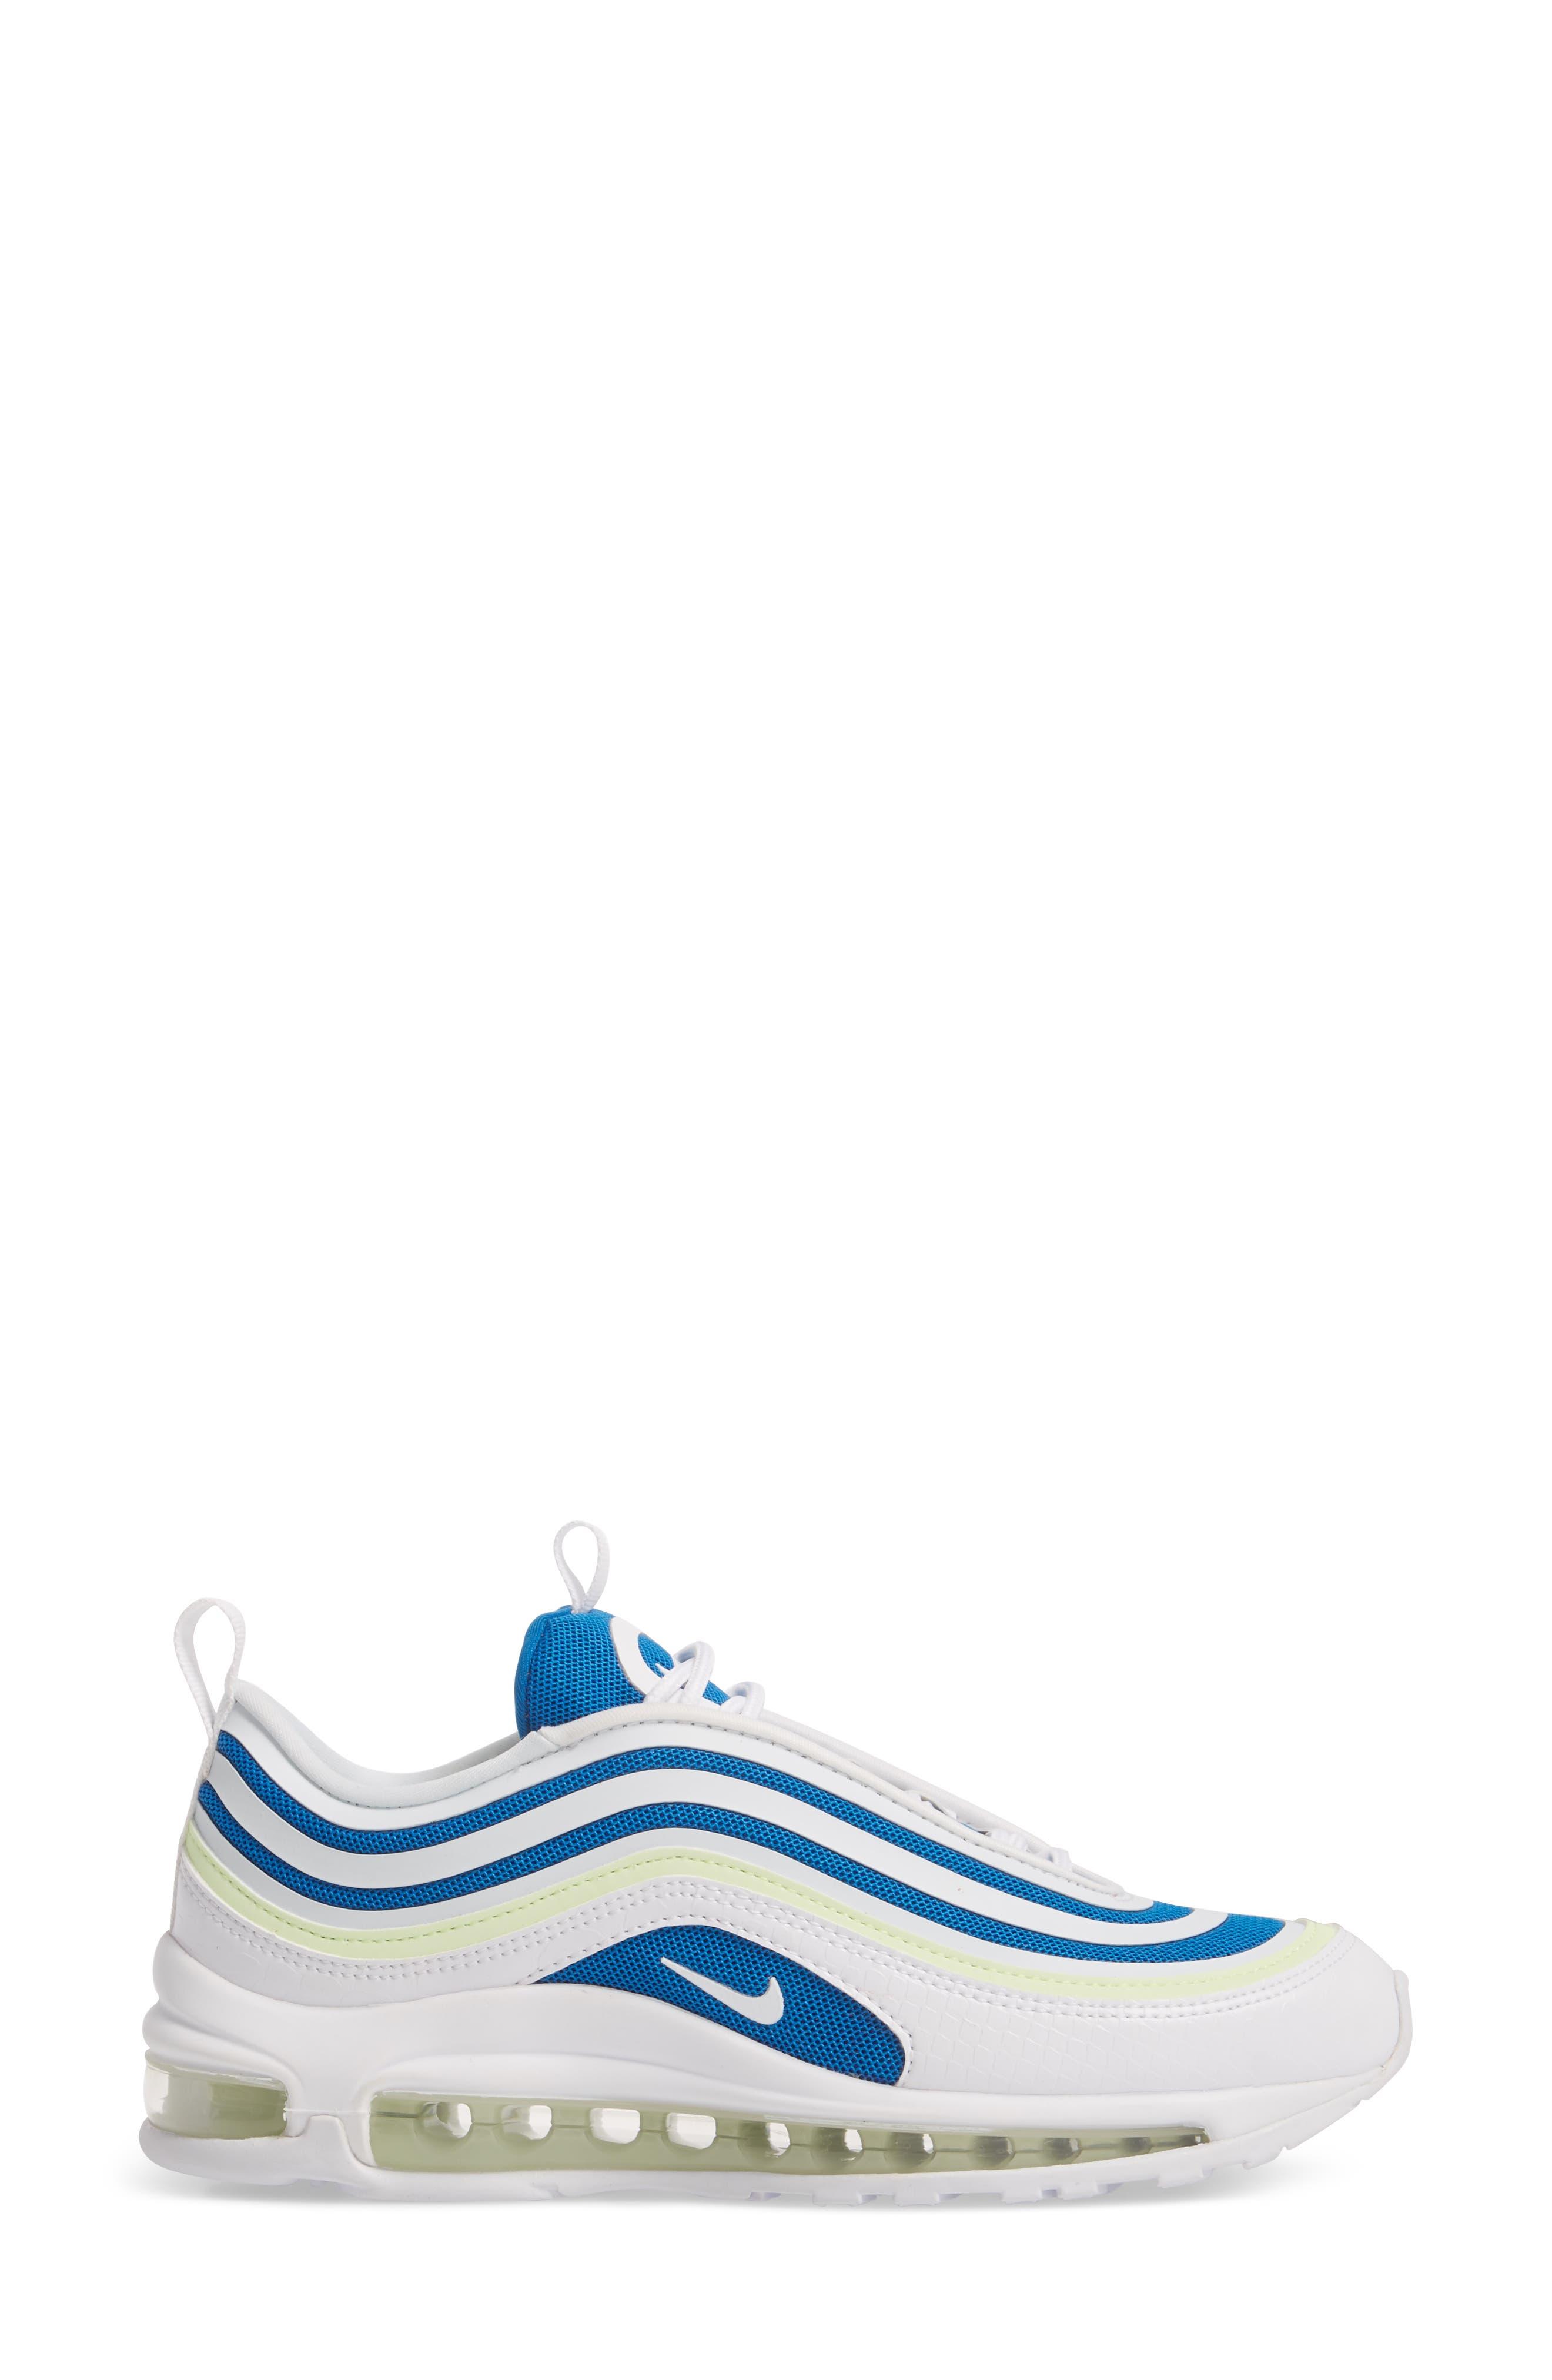 Air Max 97 Ultra '17 SE Sneaker,                             Alternate thumbnail 17, color,